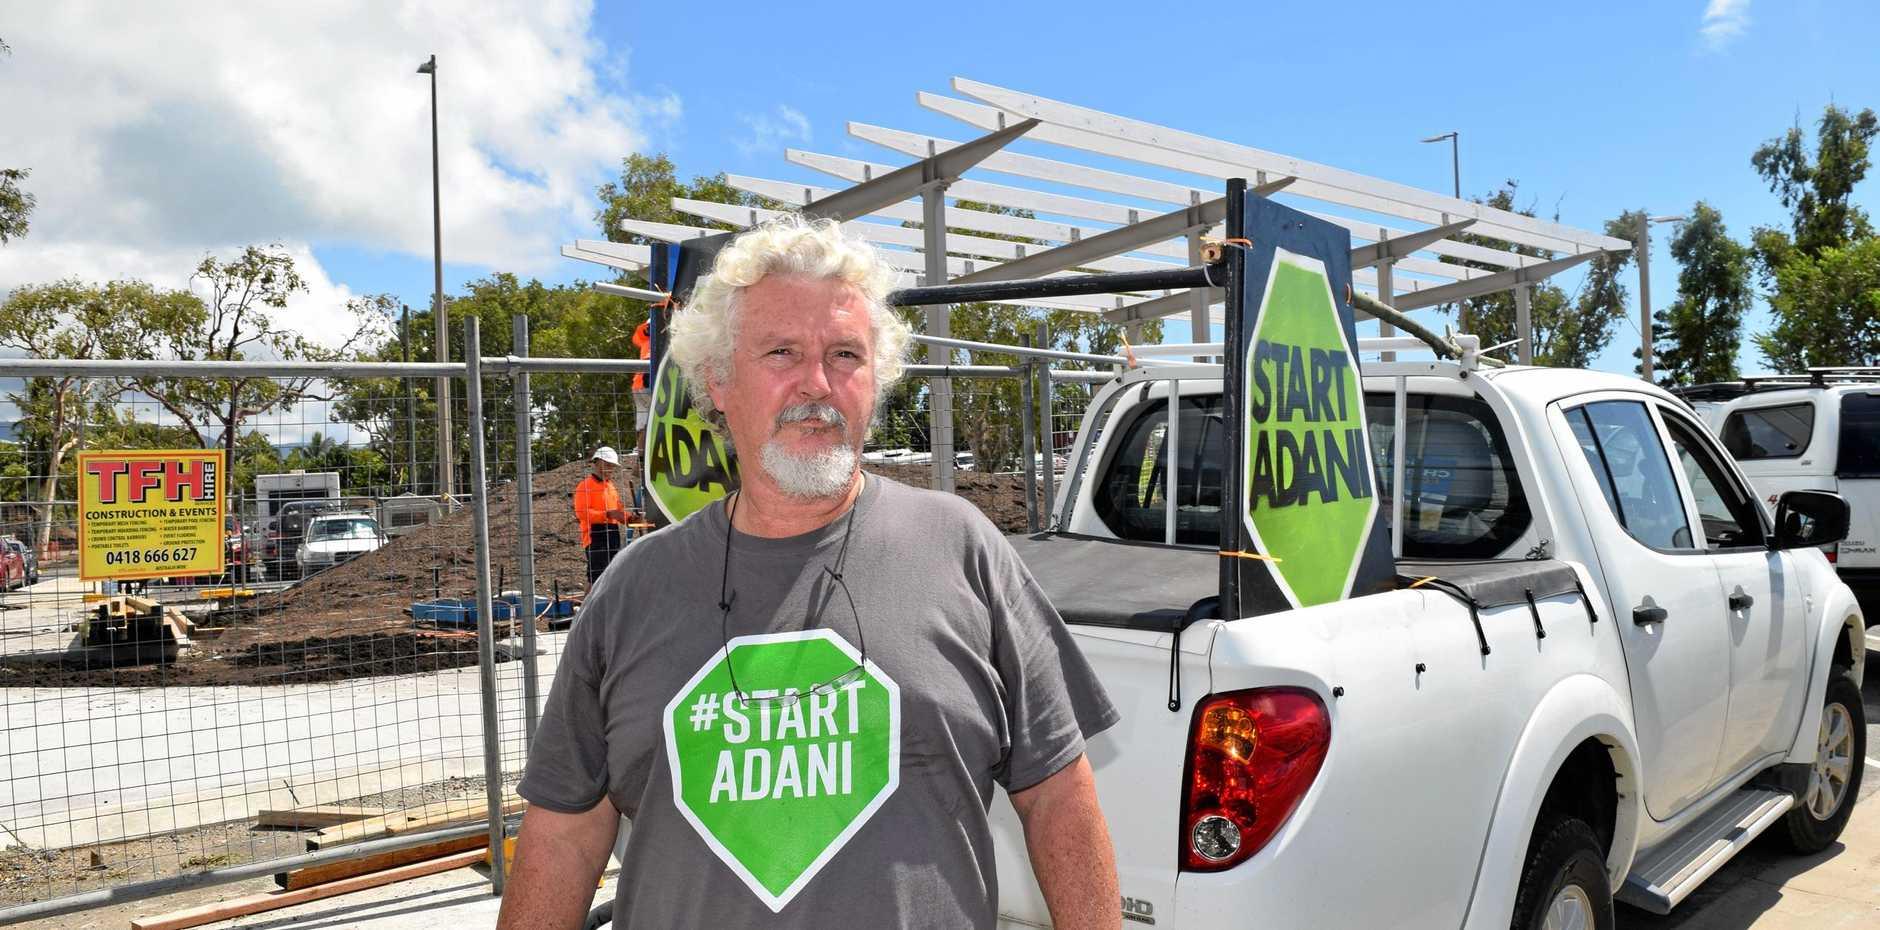 CALL TO ACT: Shane Newell wants the Adani Carmichael coal mine to go ahead.